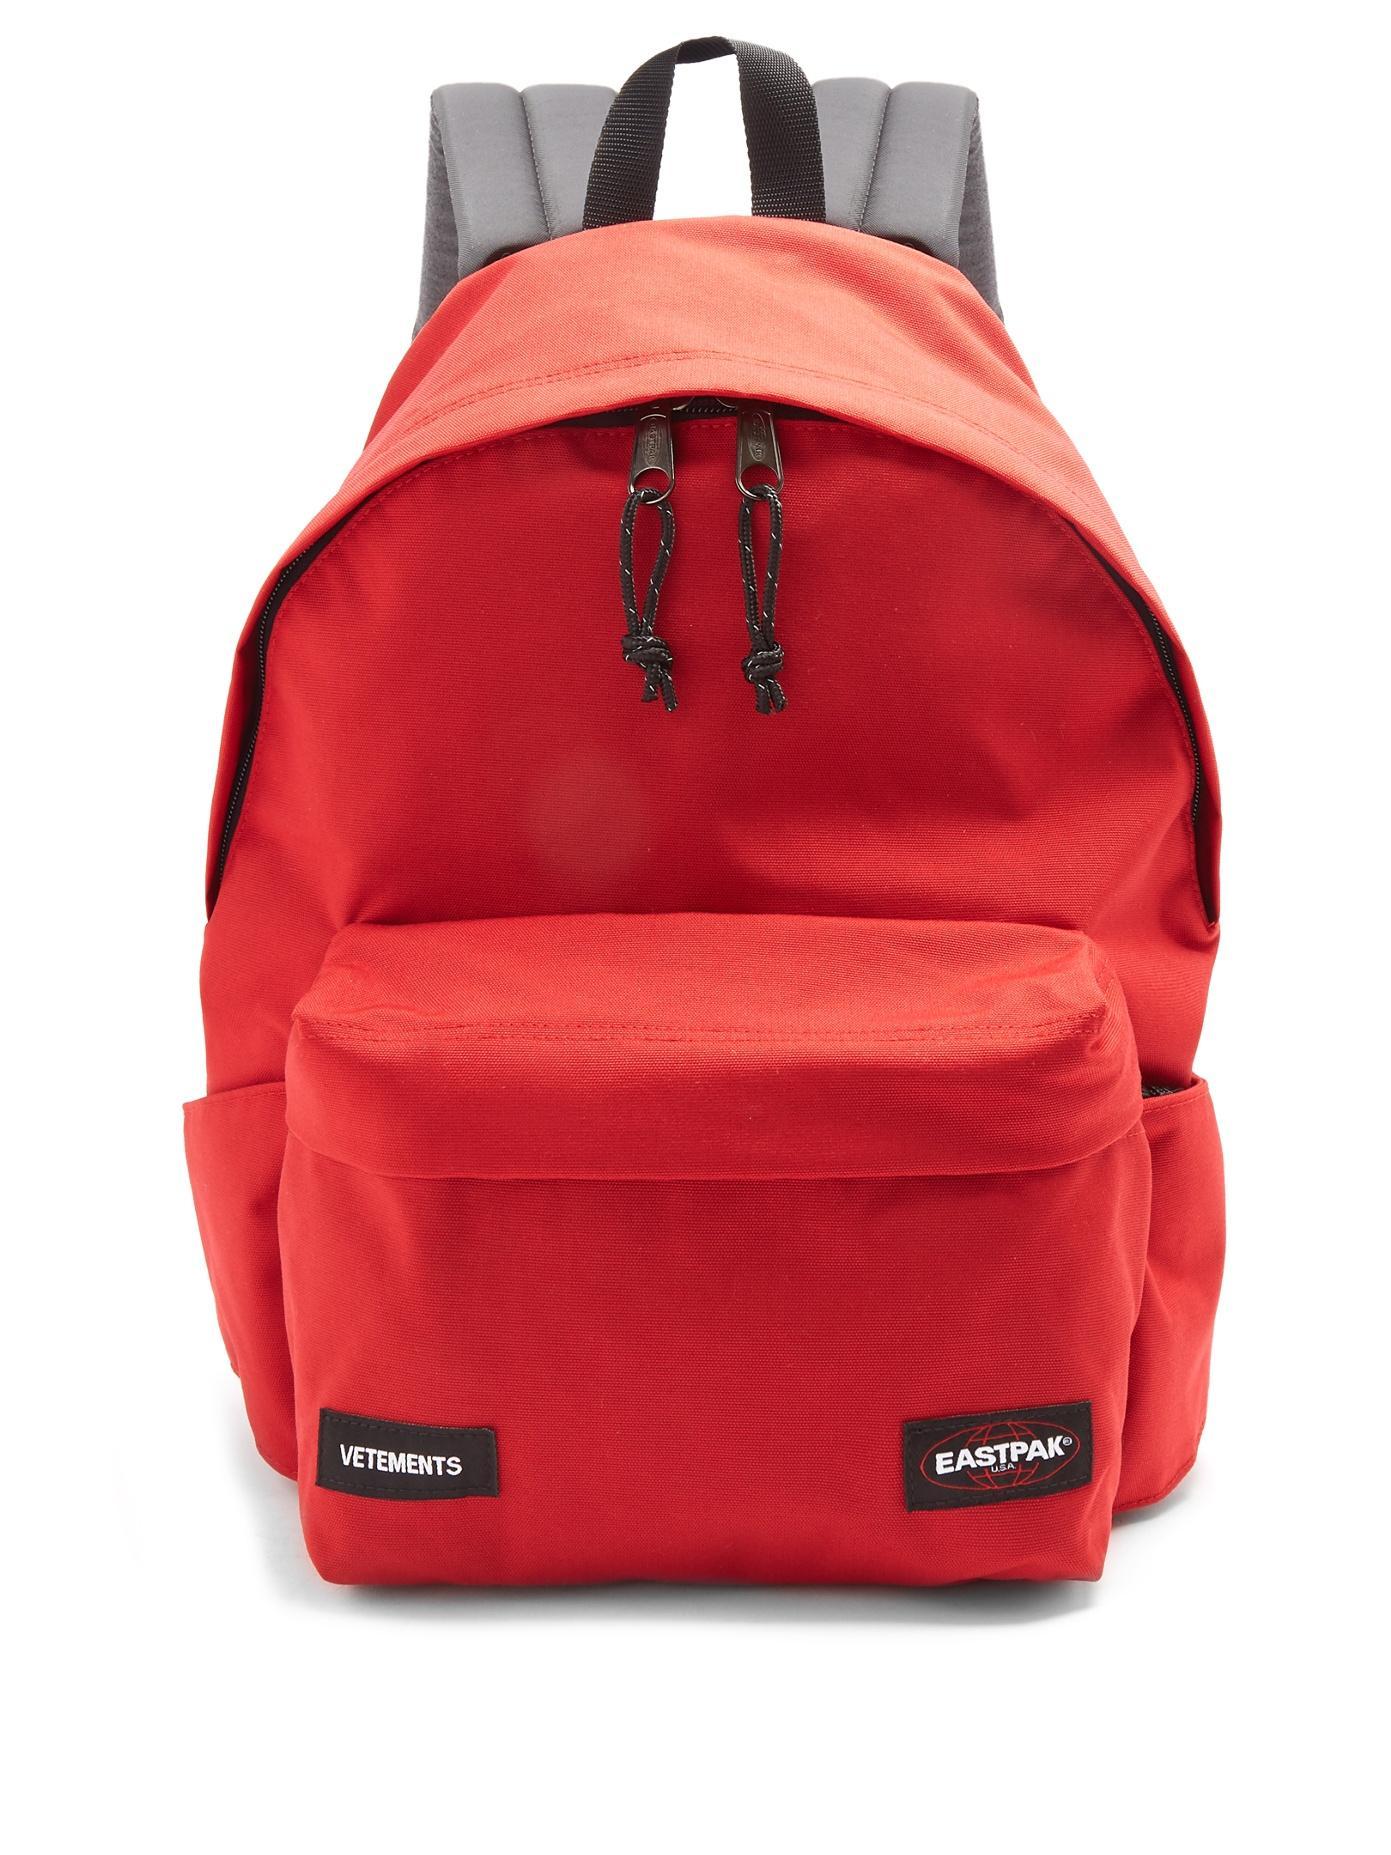 Vetements X Eastpak Backpack In Red